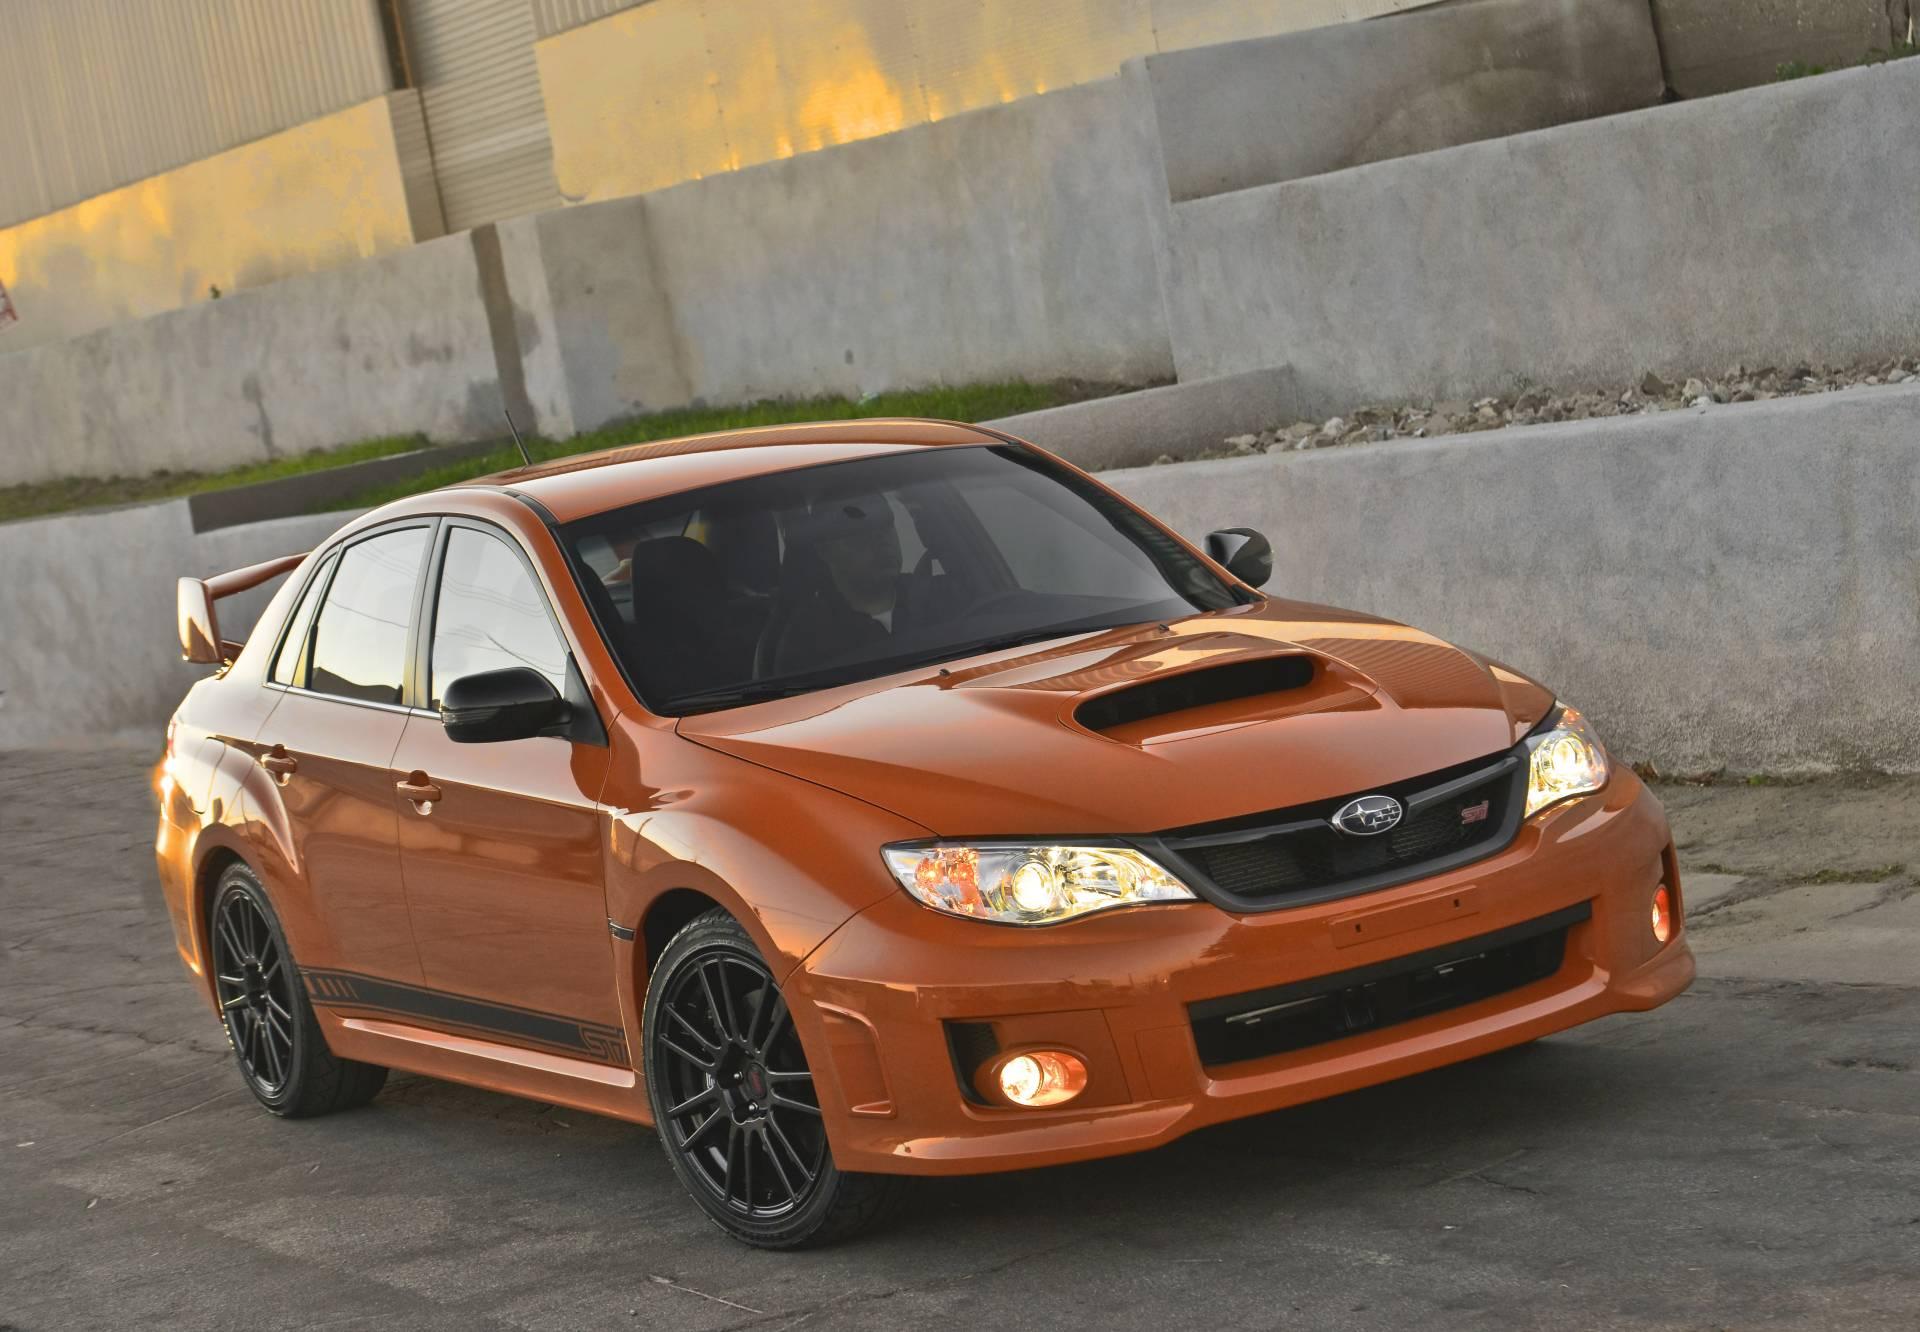 subaru wrx sti impreza special orange edition editions forester sema problems outback front brake cars conceptcarz hit legacy version usa